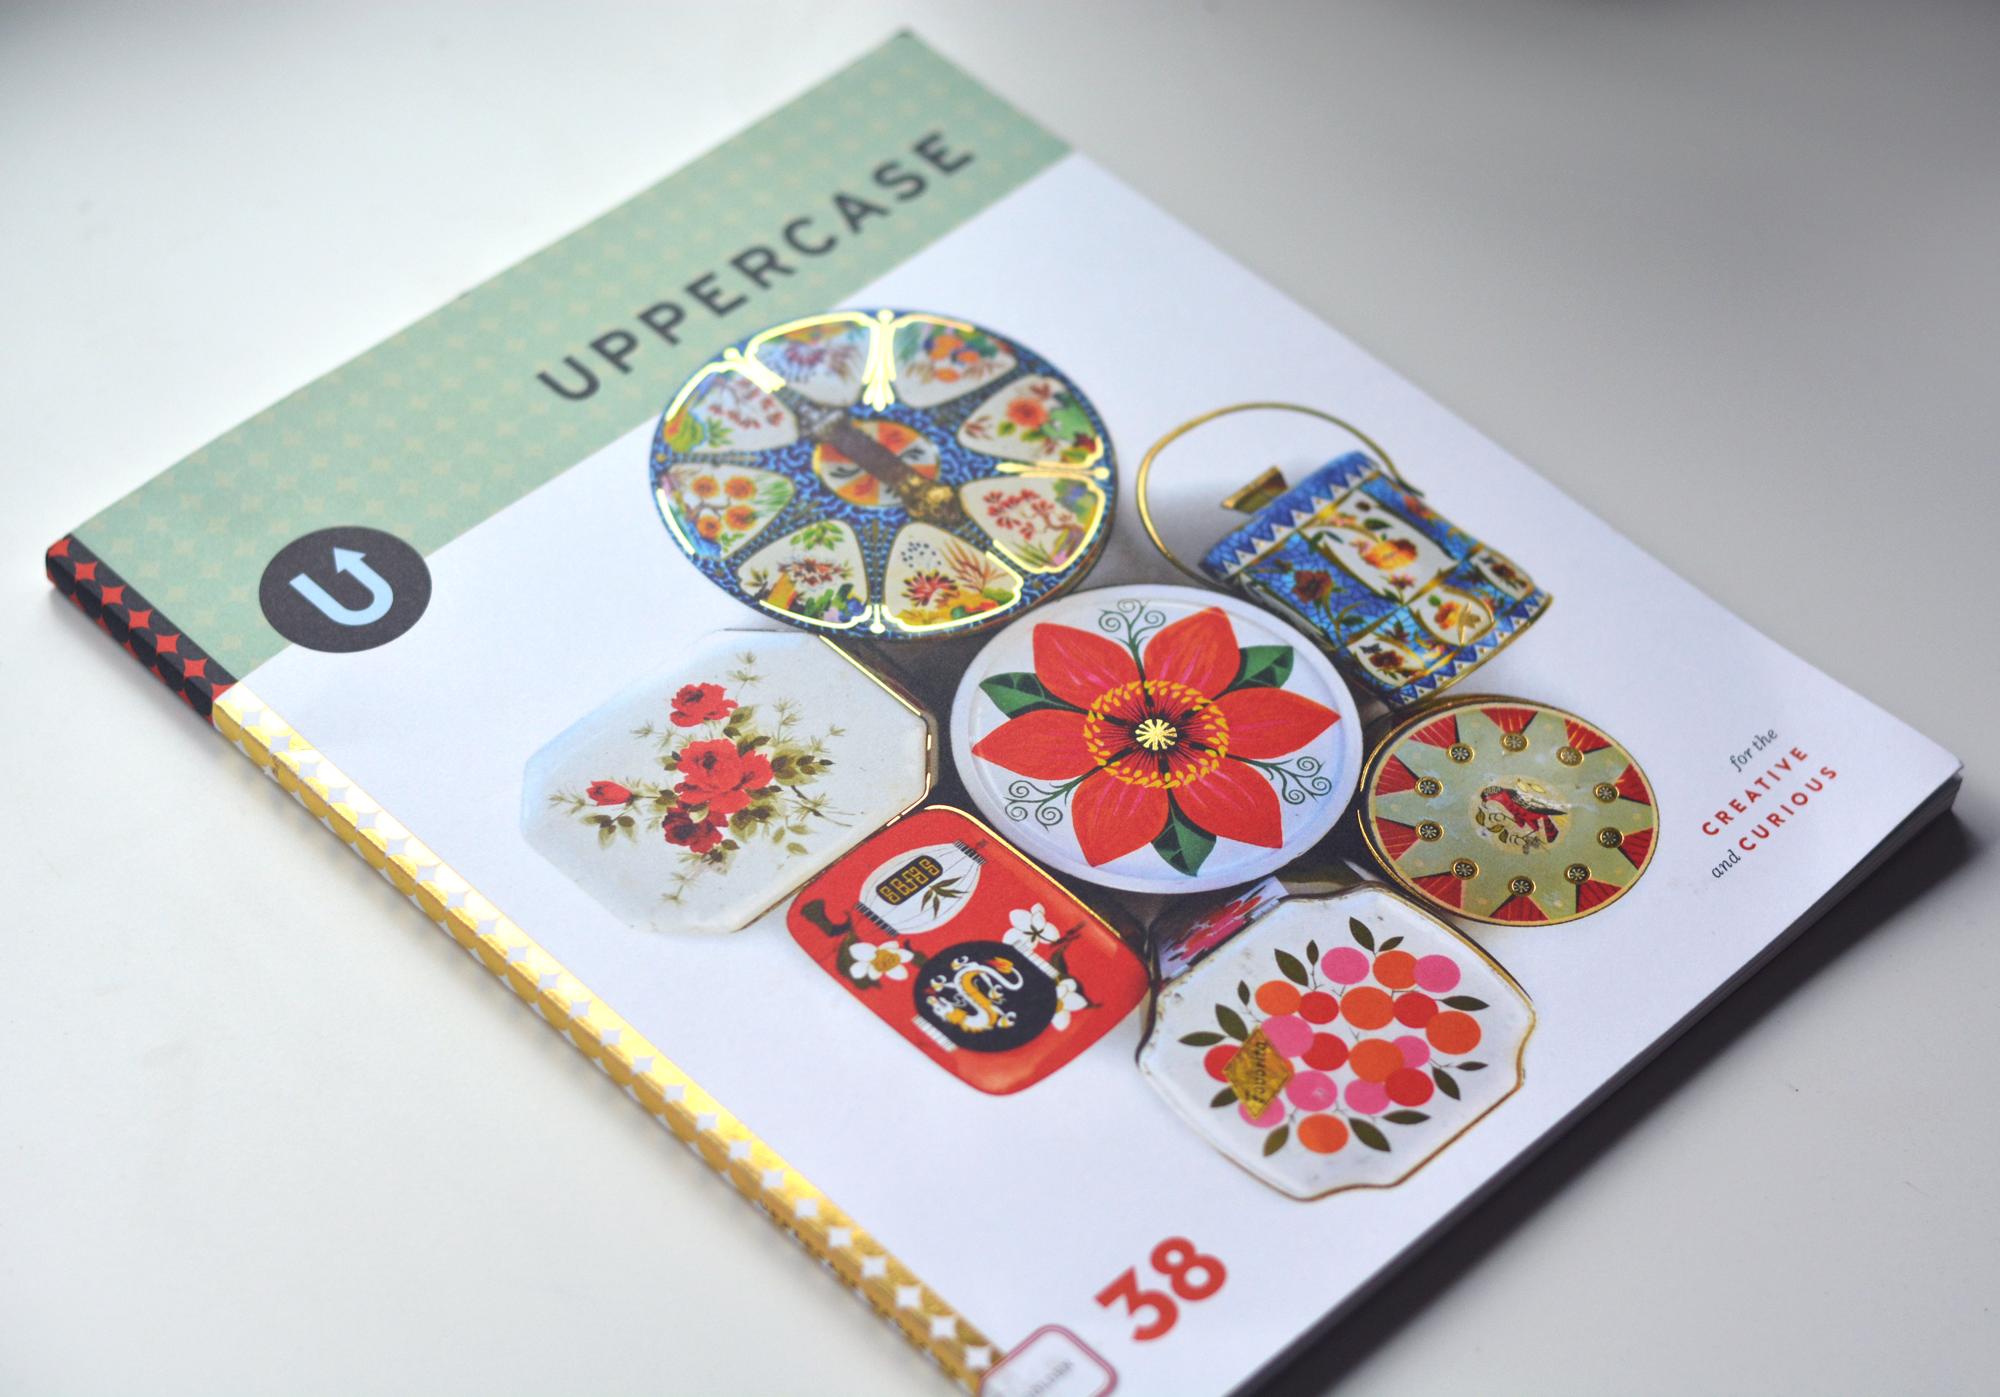 Uppercase Magazine 38 Skye McNeill